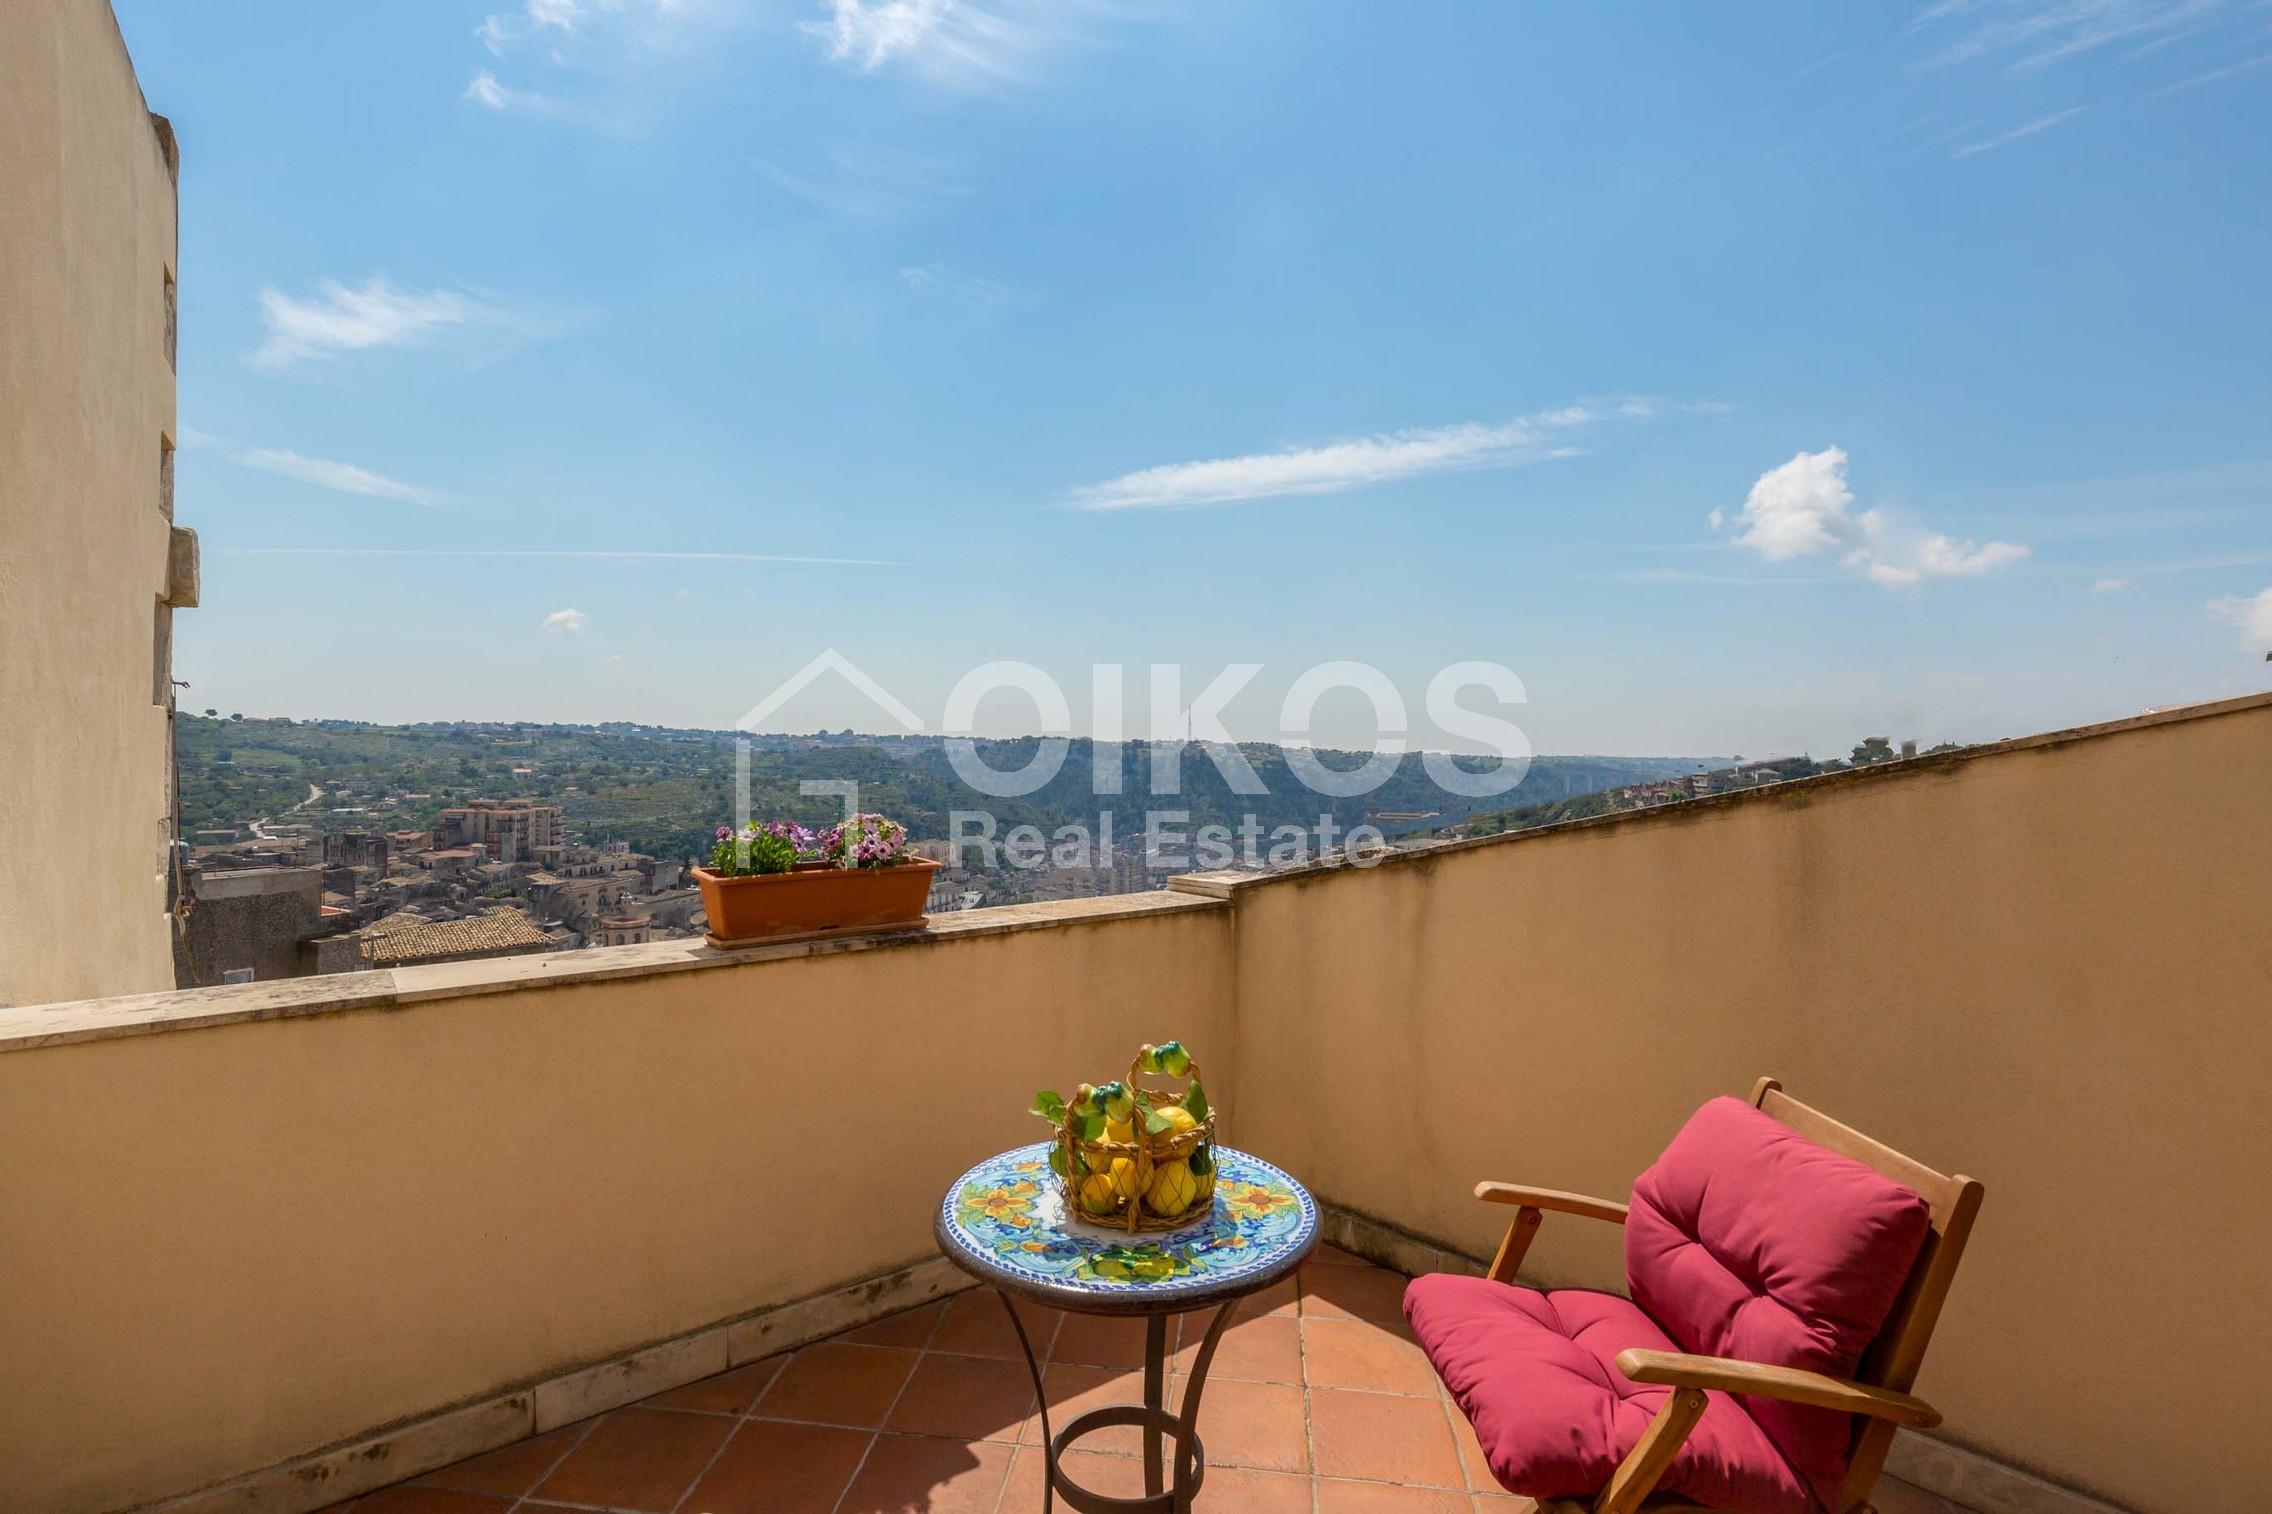 Casa con terrazzino e vista panoramica 1